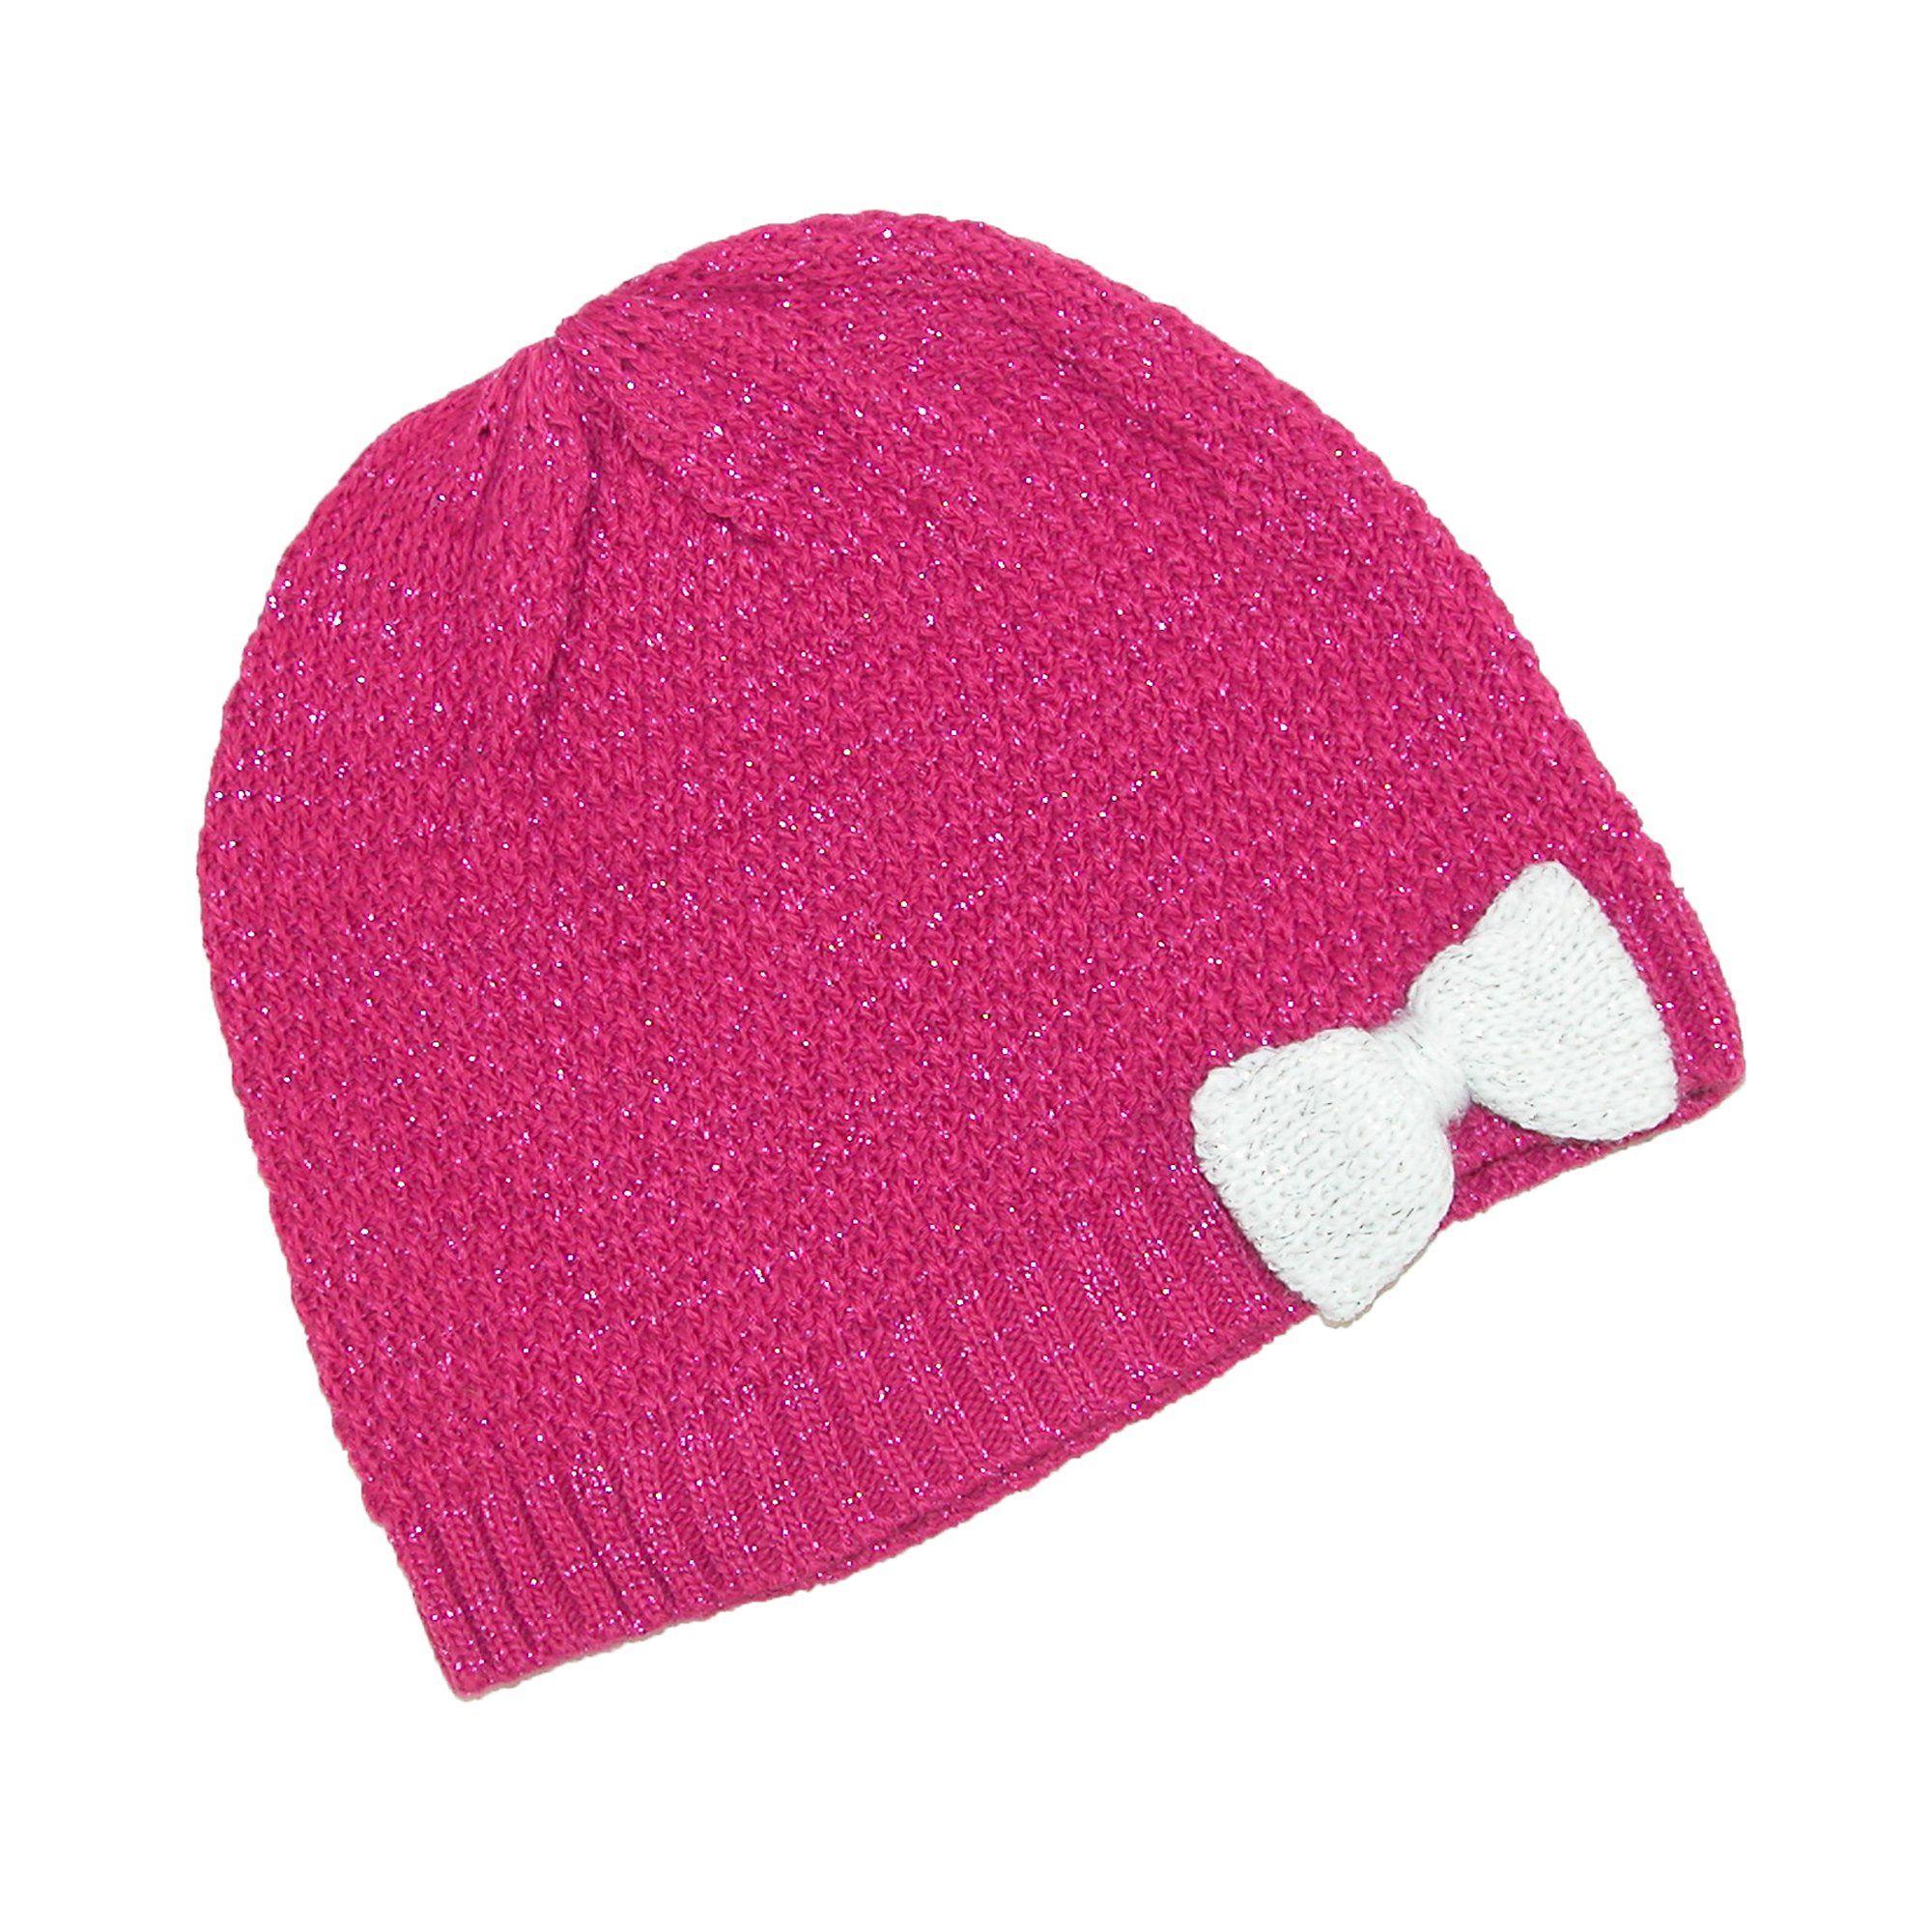 ed791b37da8 Grand Sierra Girls  7-16 Knit Beanie Hat with Bow